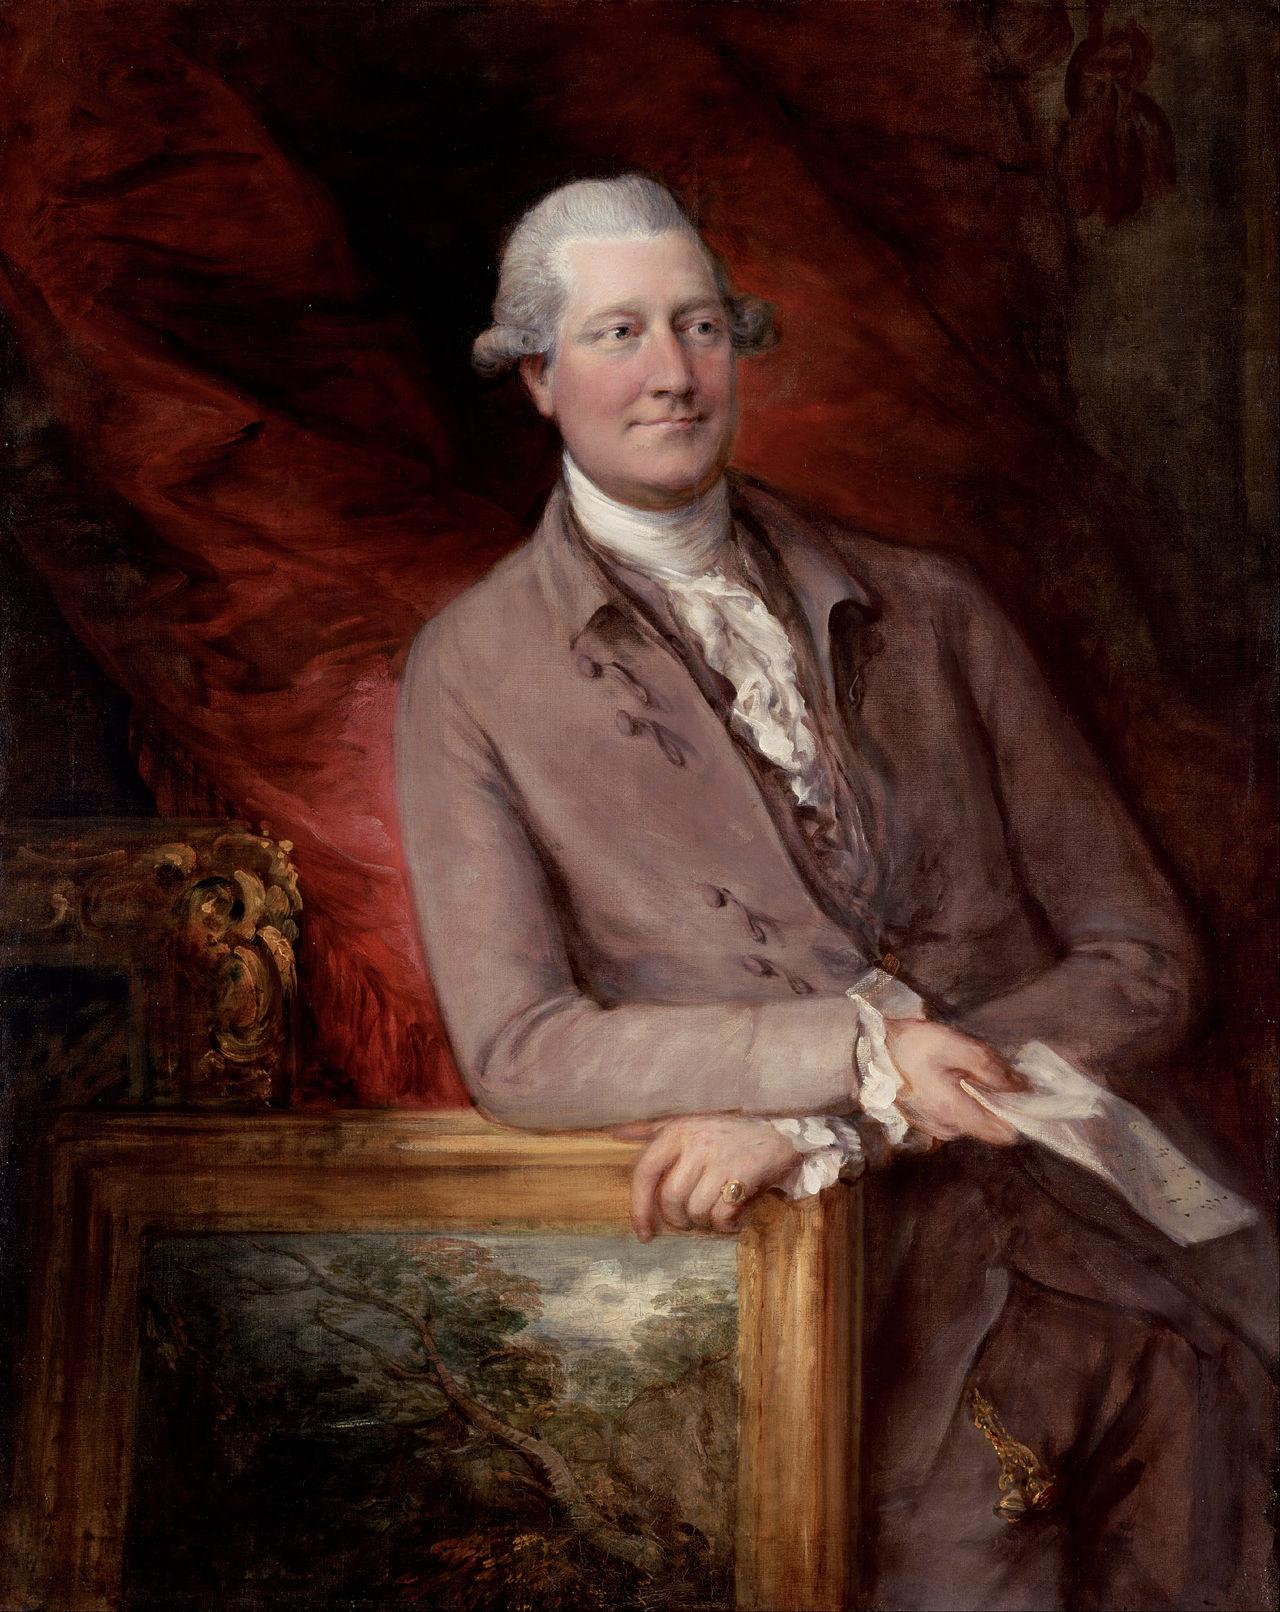 Portrait of James Christie painted by Thomas Gainsborough